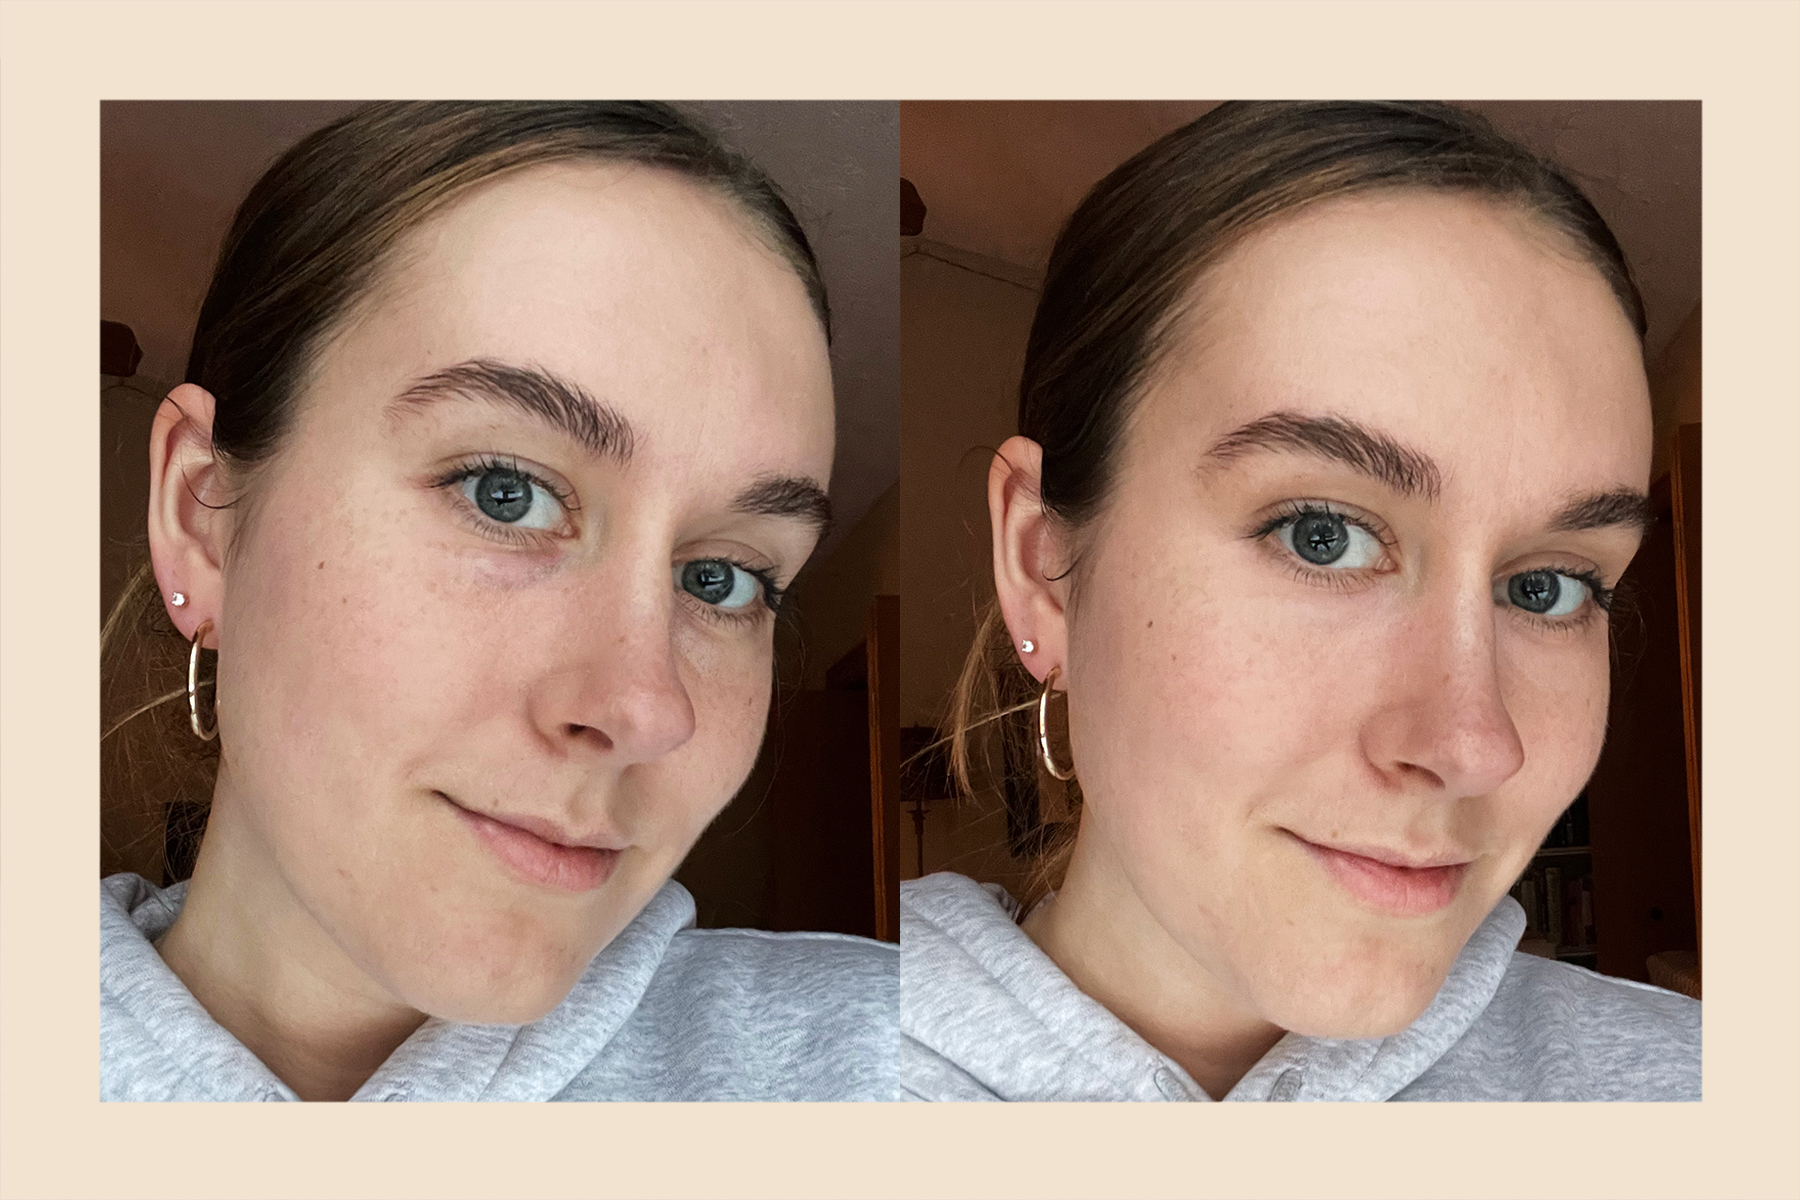 Essence High Beauty Under Eye Brightening Concealer review